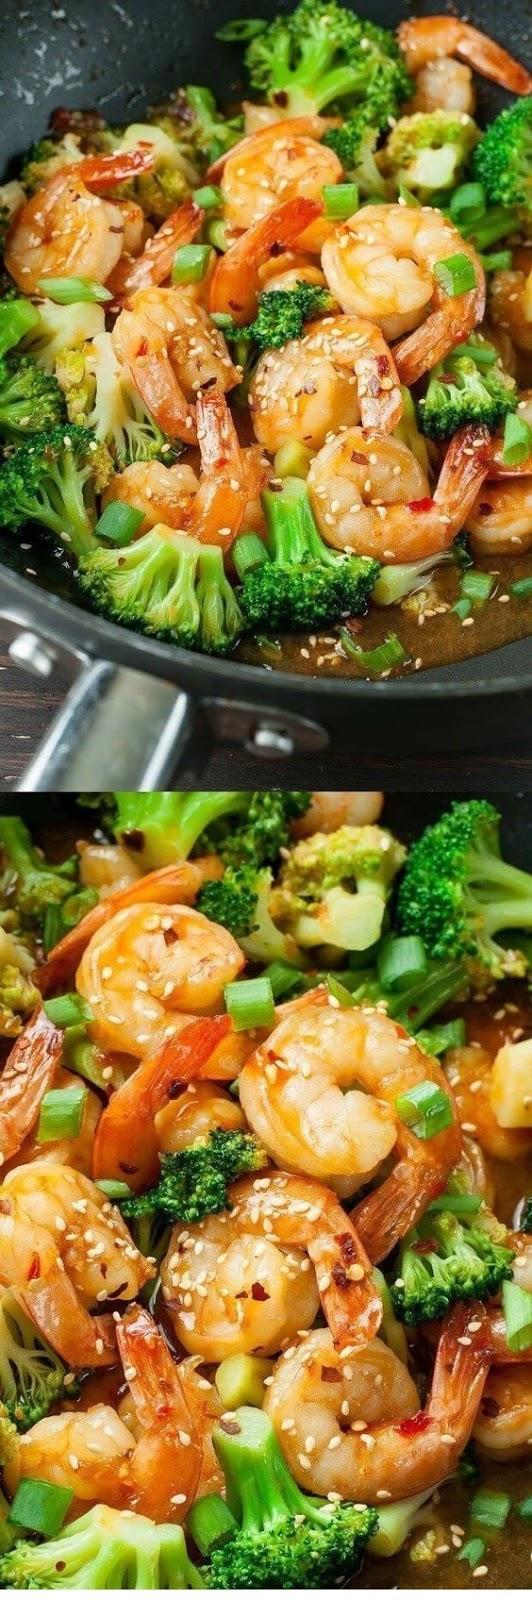 Szechuan Shrimp And Broccoli